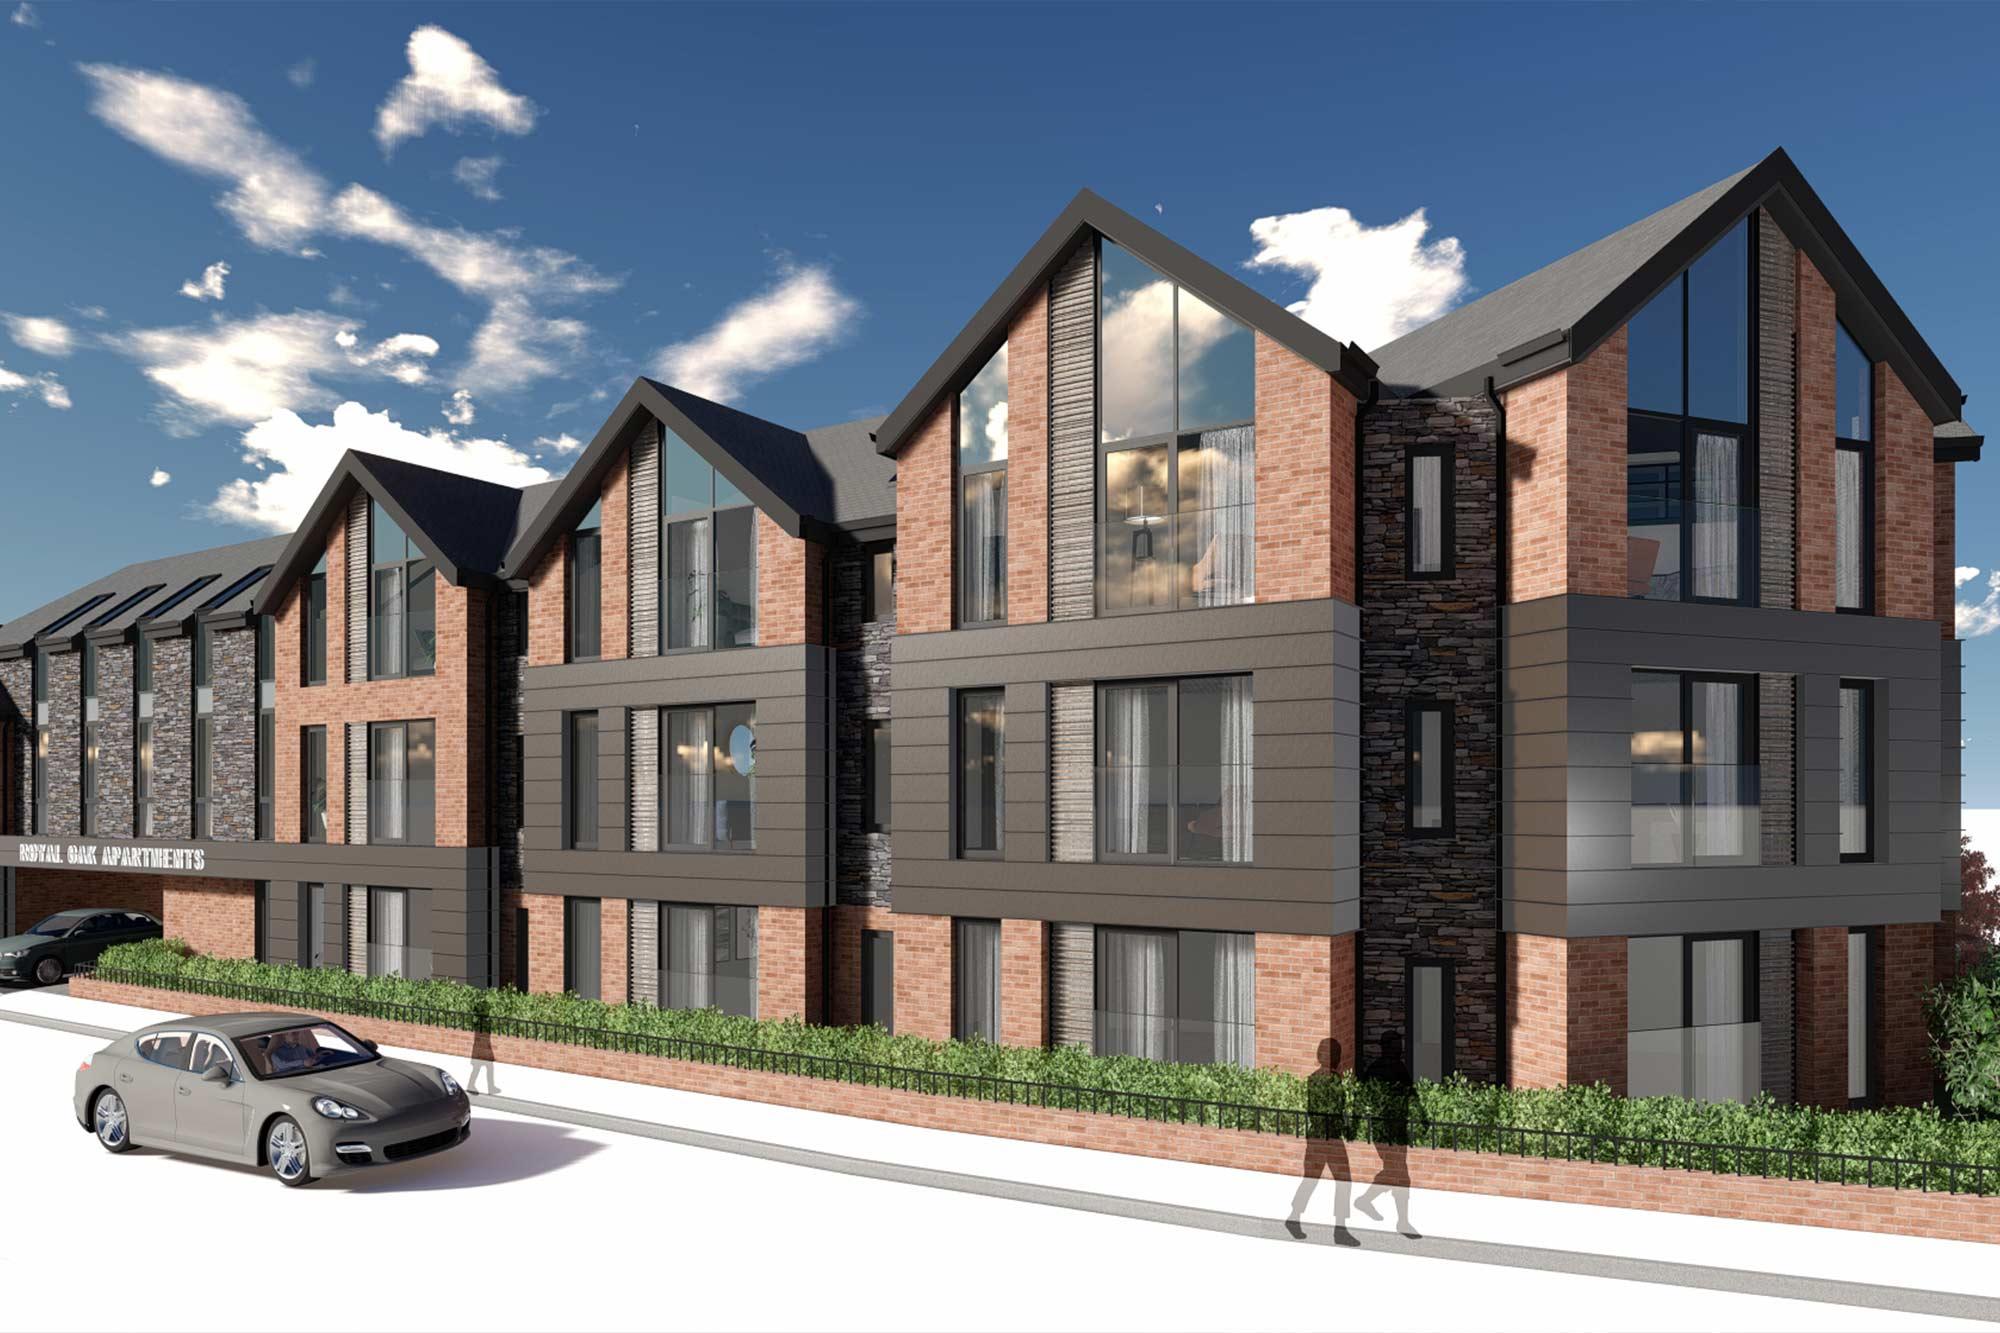 Royal Oak Apartments Residential Apartment Block in Poulton-le-Fylde, contemporary Victorian architecture